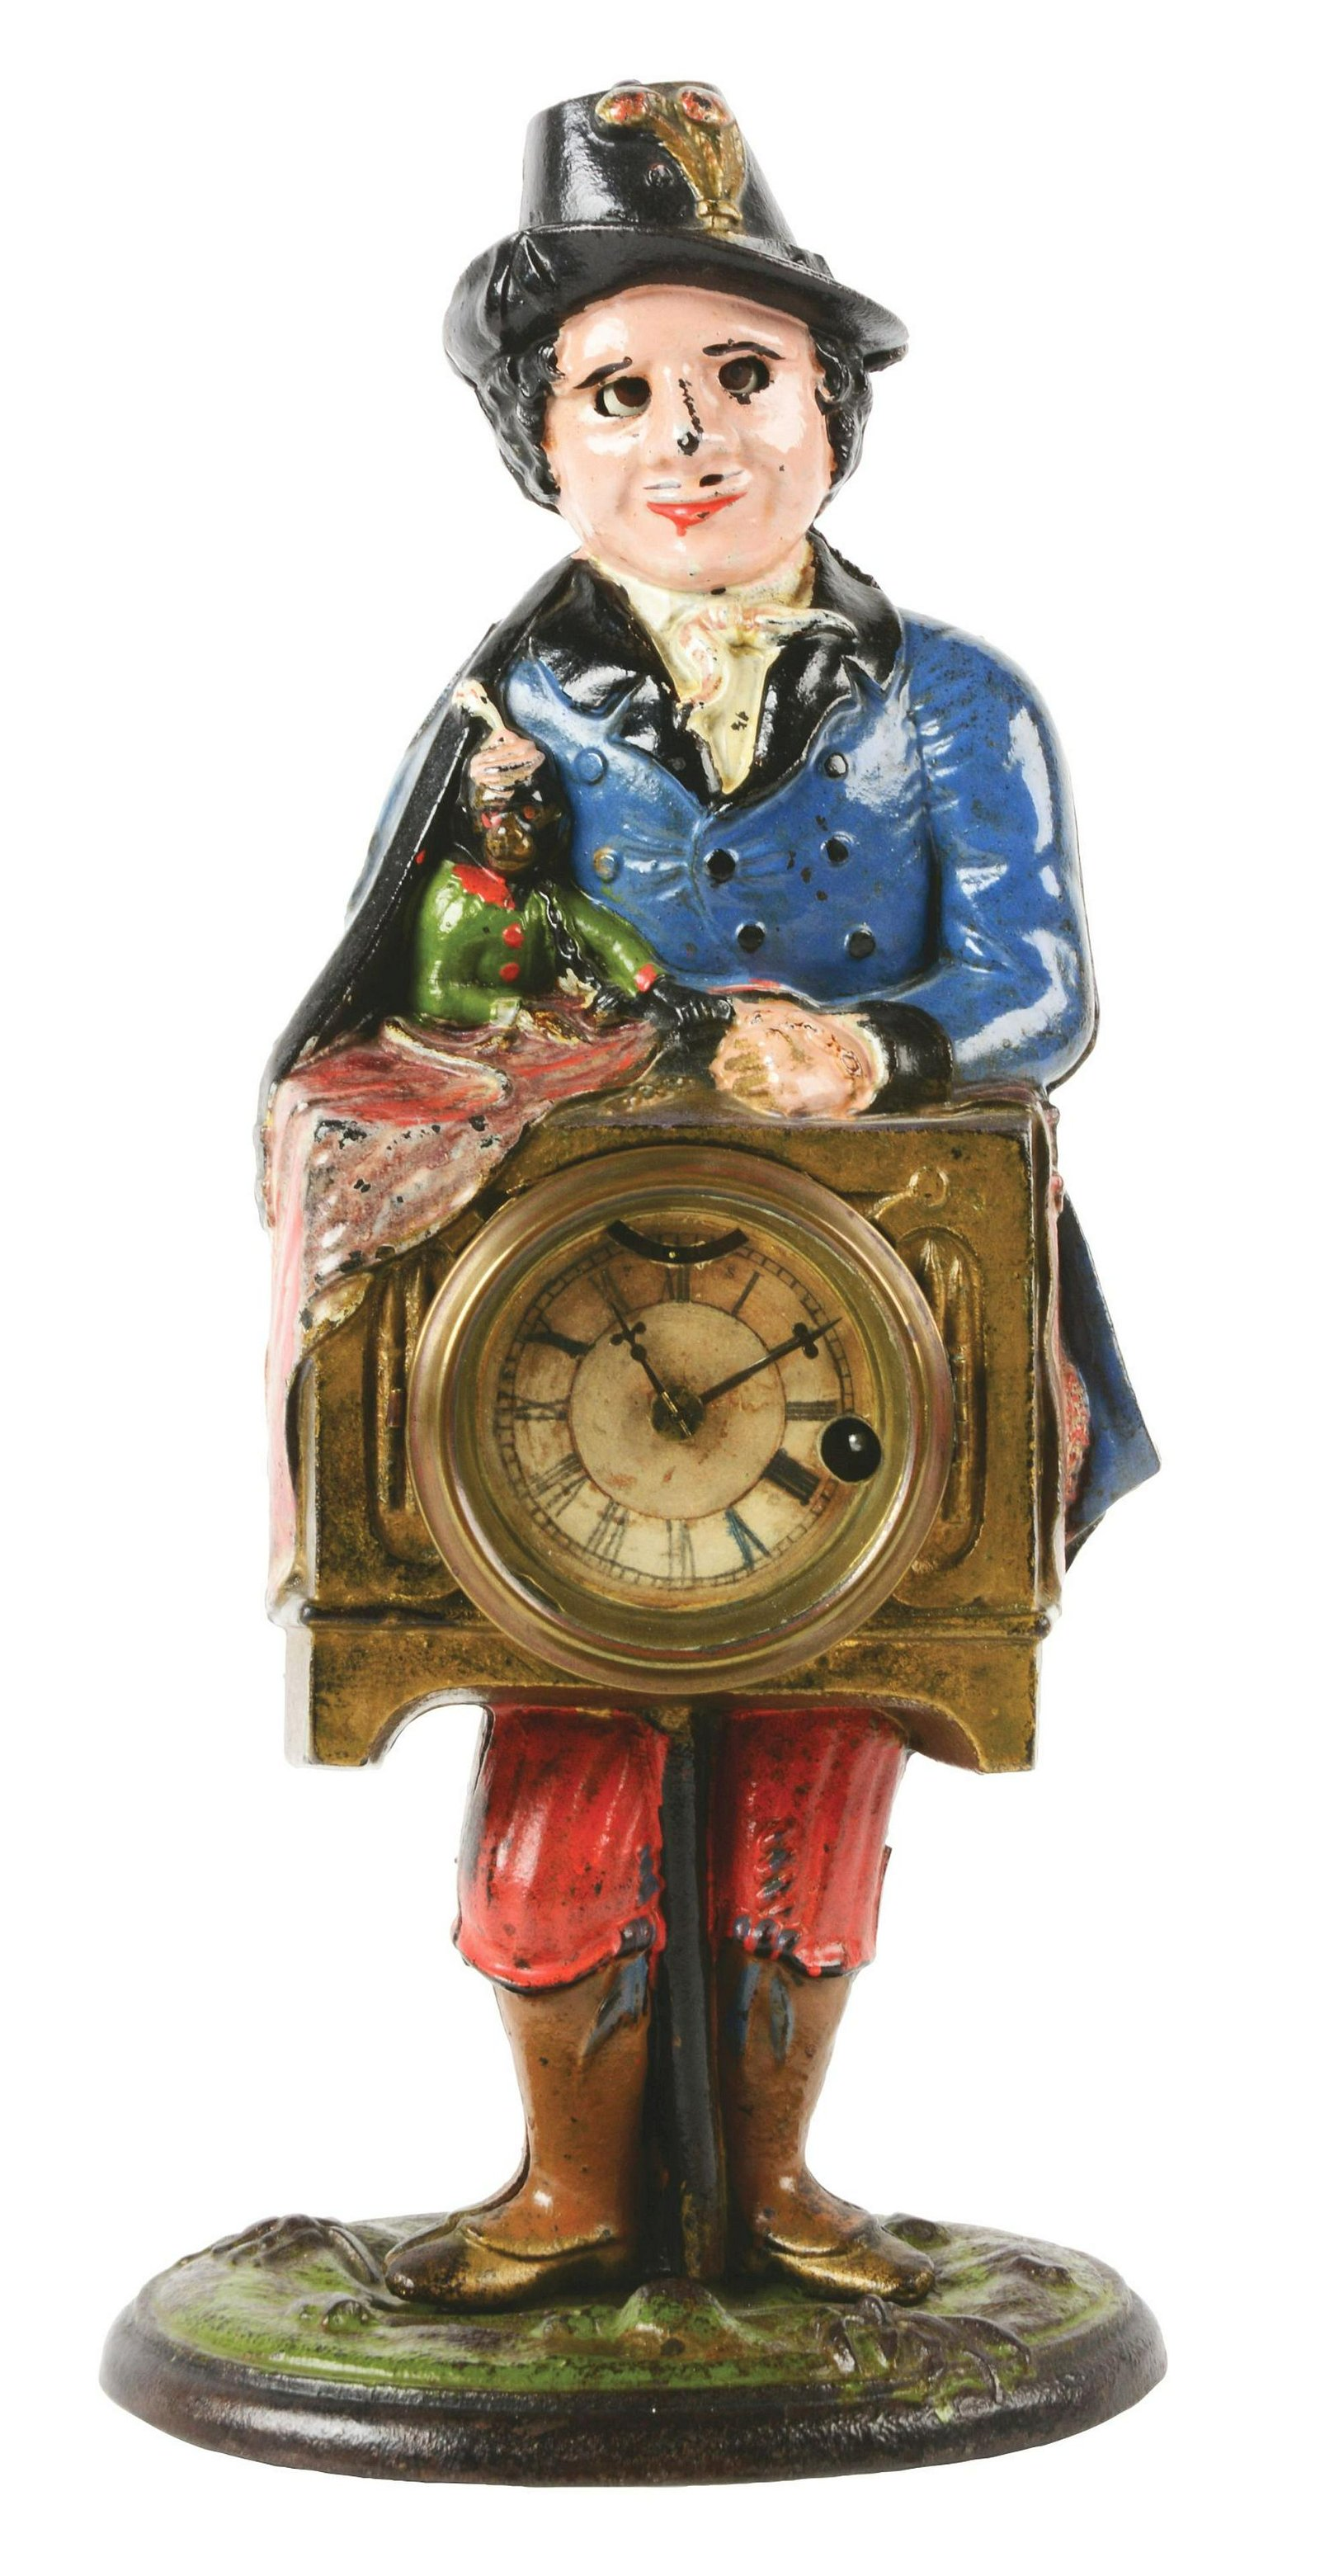 Cast-Iron Monkey & Organ Grinder Blinking Eye Clock.